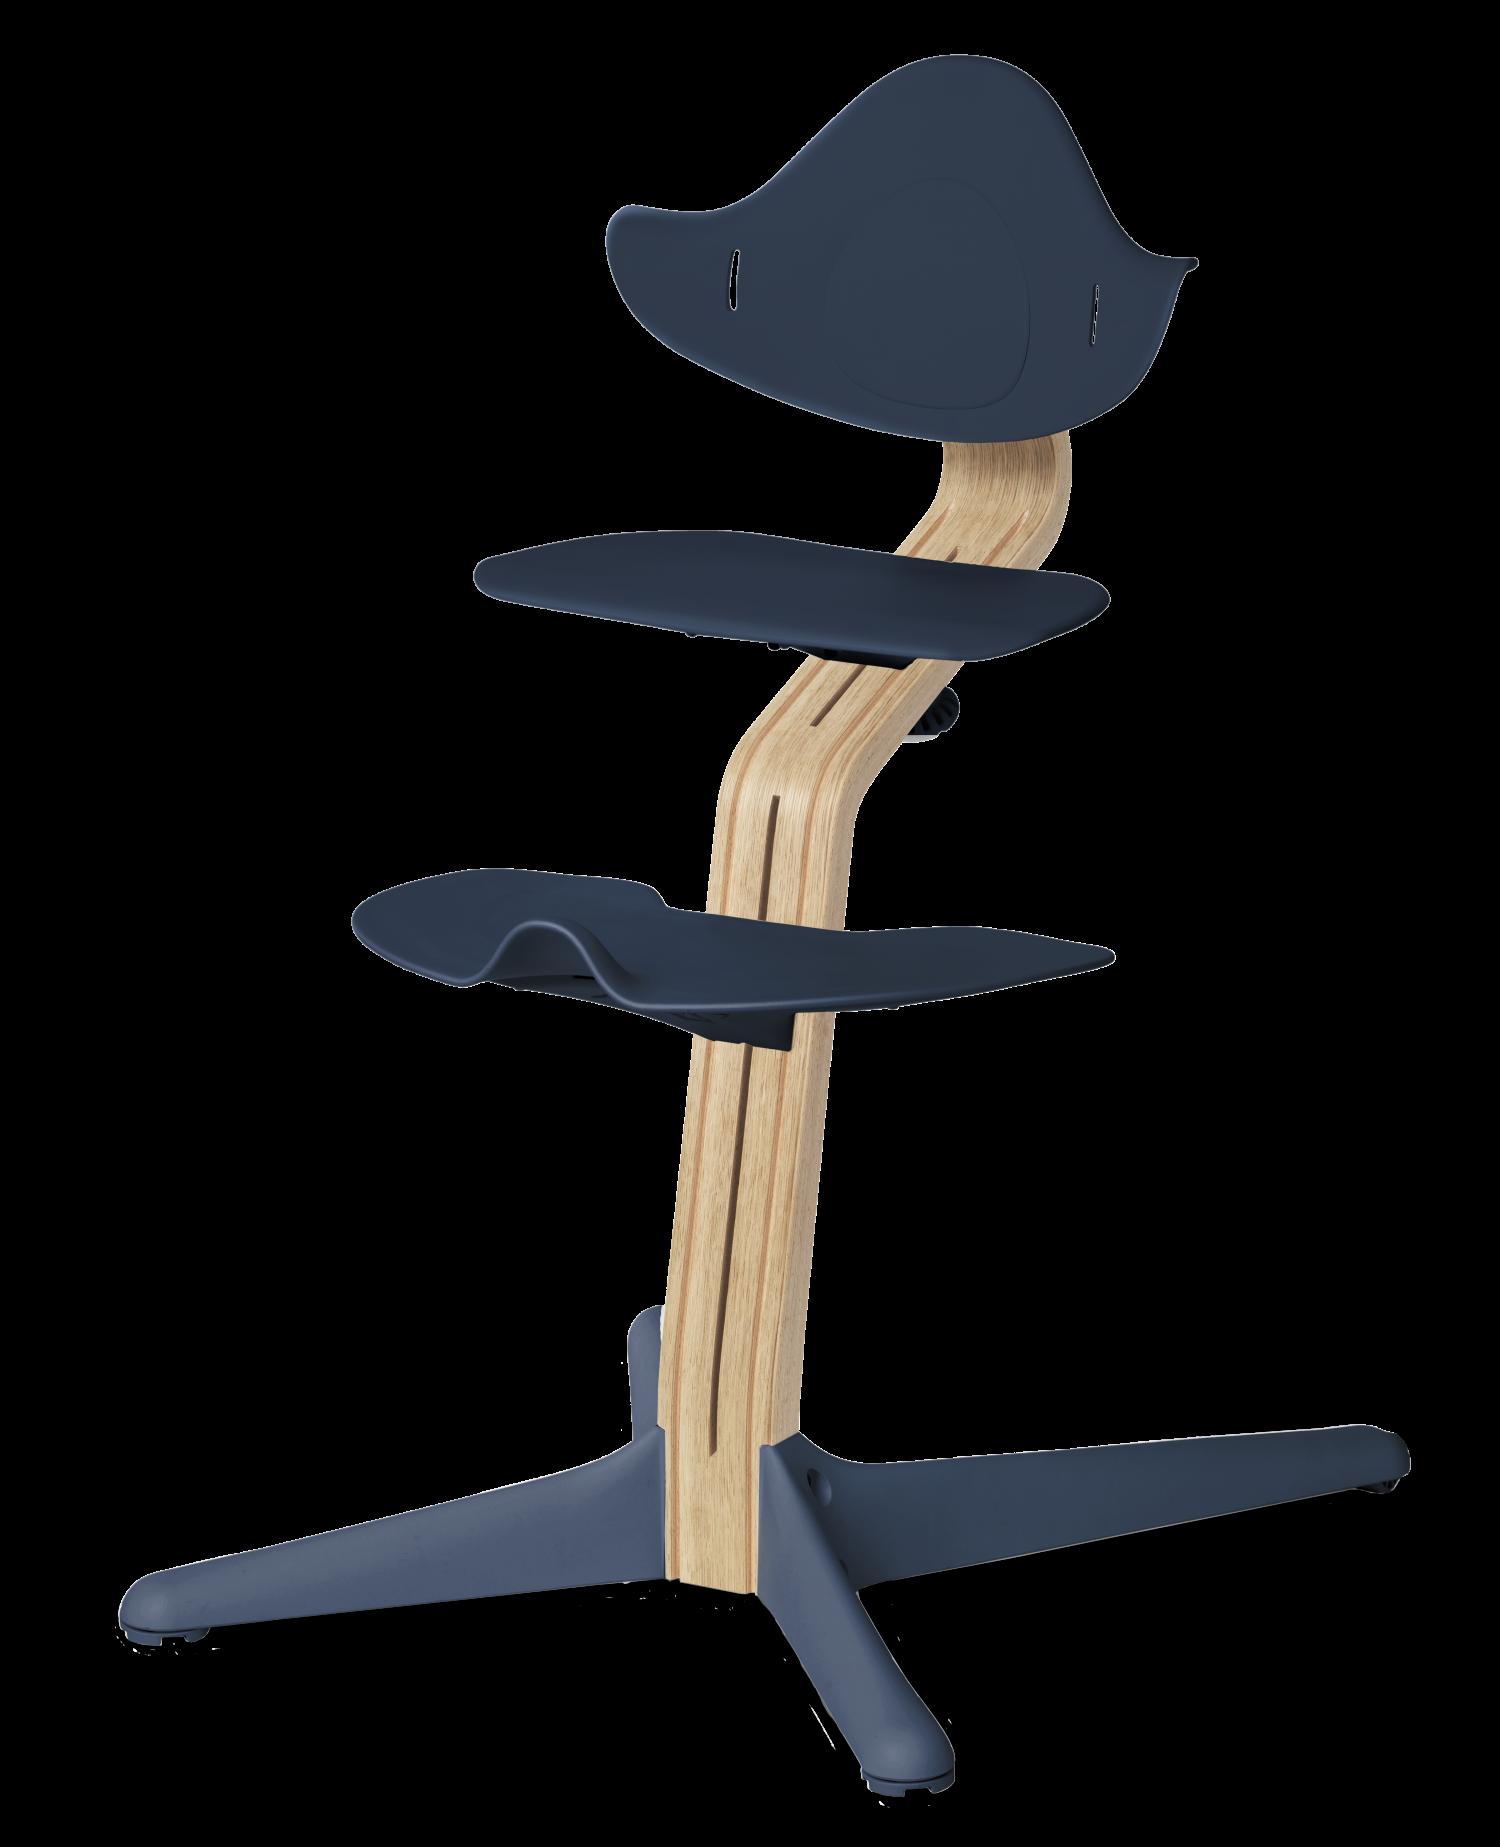 Nomi NOMI highchair meegroeistoel Basis eiken wit oiled en stoel Navy